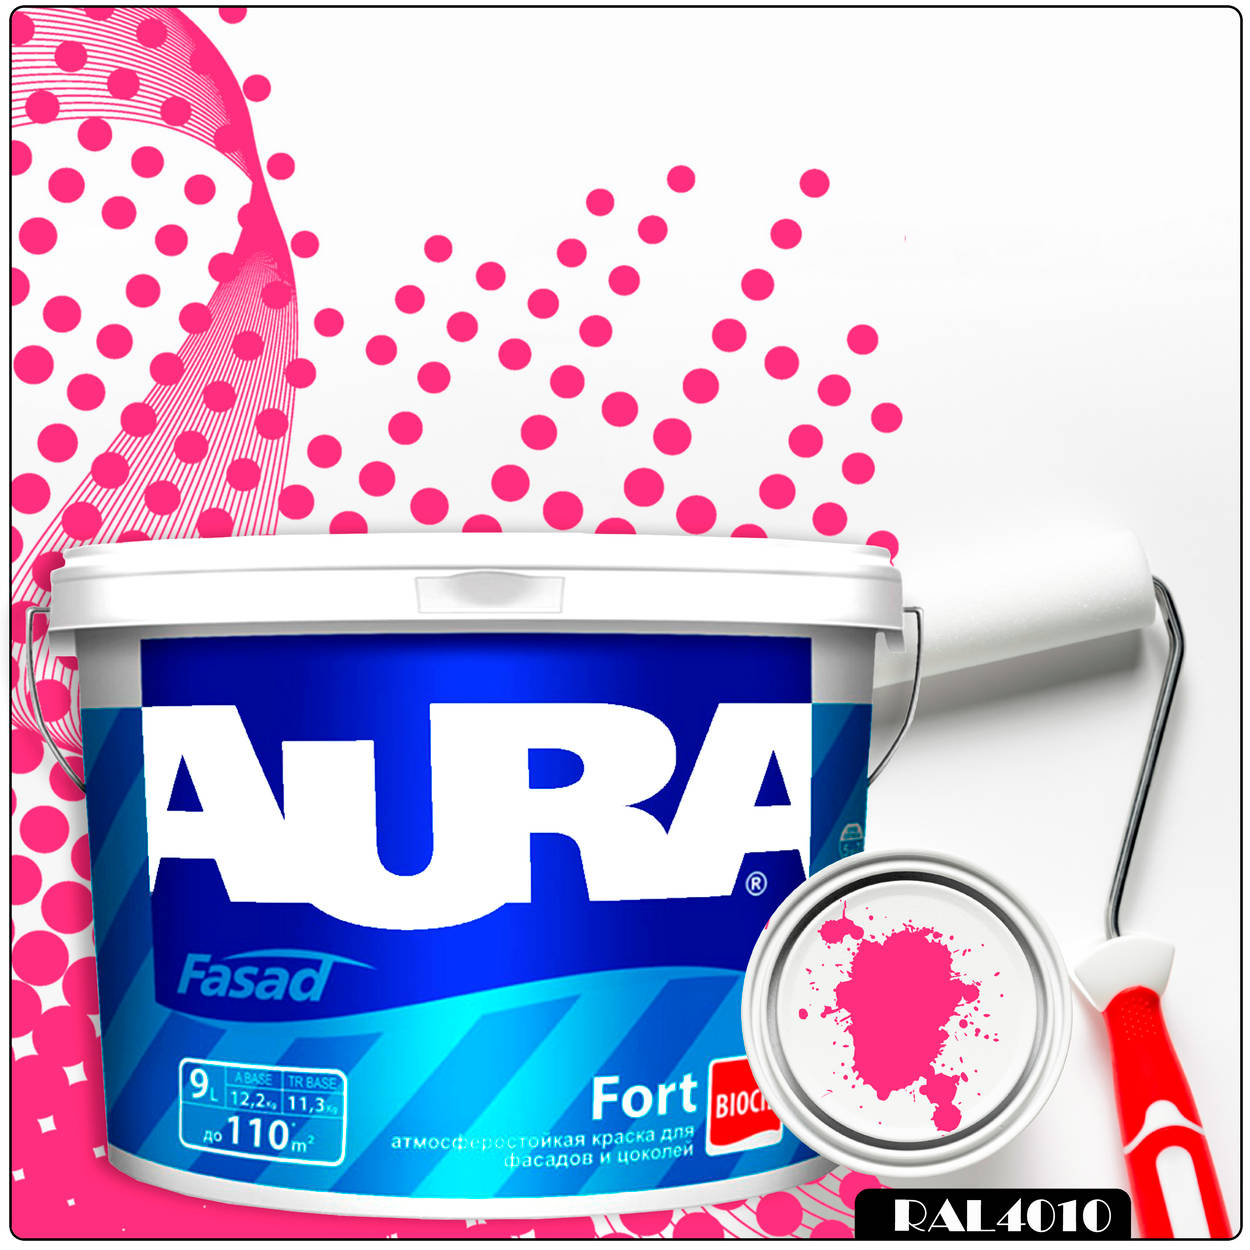 Фото 10 - Краска Aura Fasad Fort, RAL 4010 Телемагента, латексная, матовая, для фасада и цоколей, 9л, Аура.